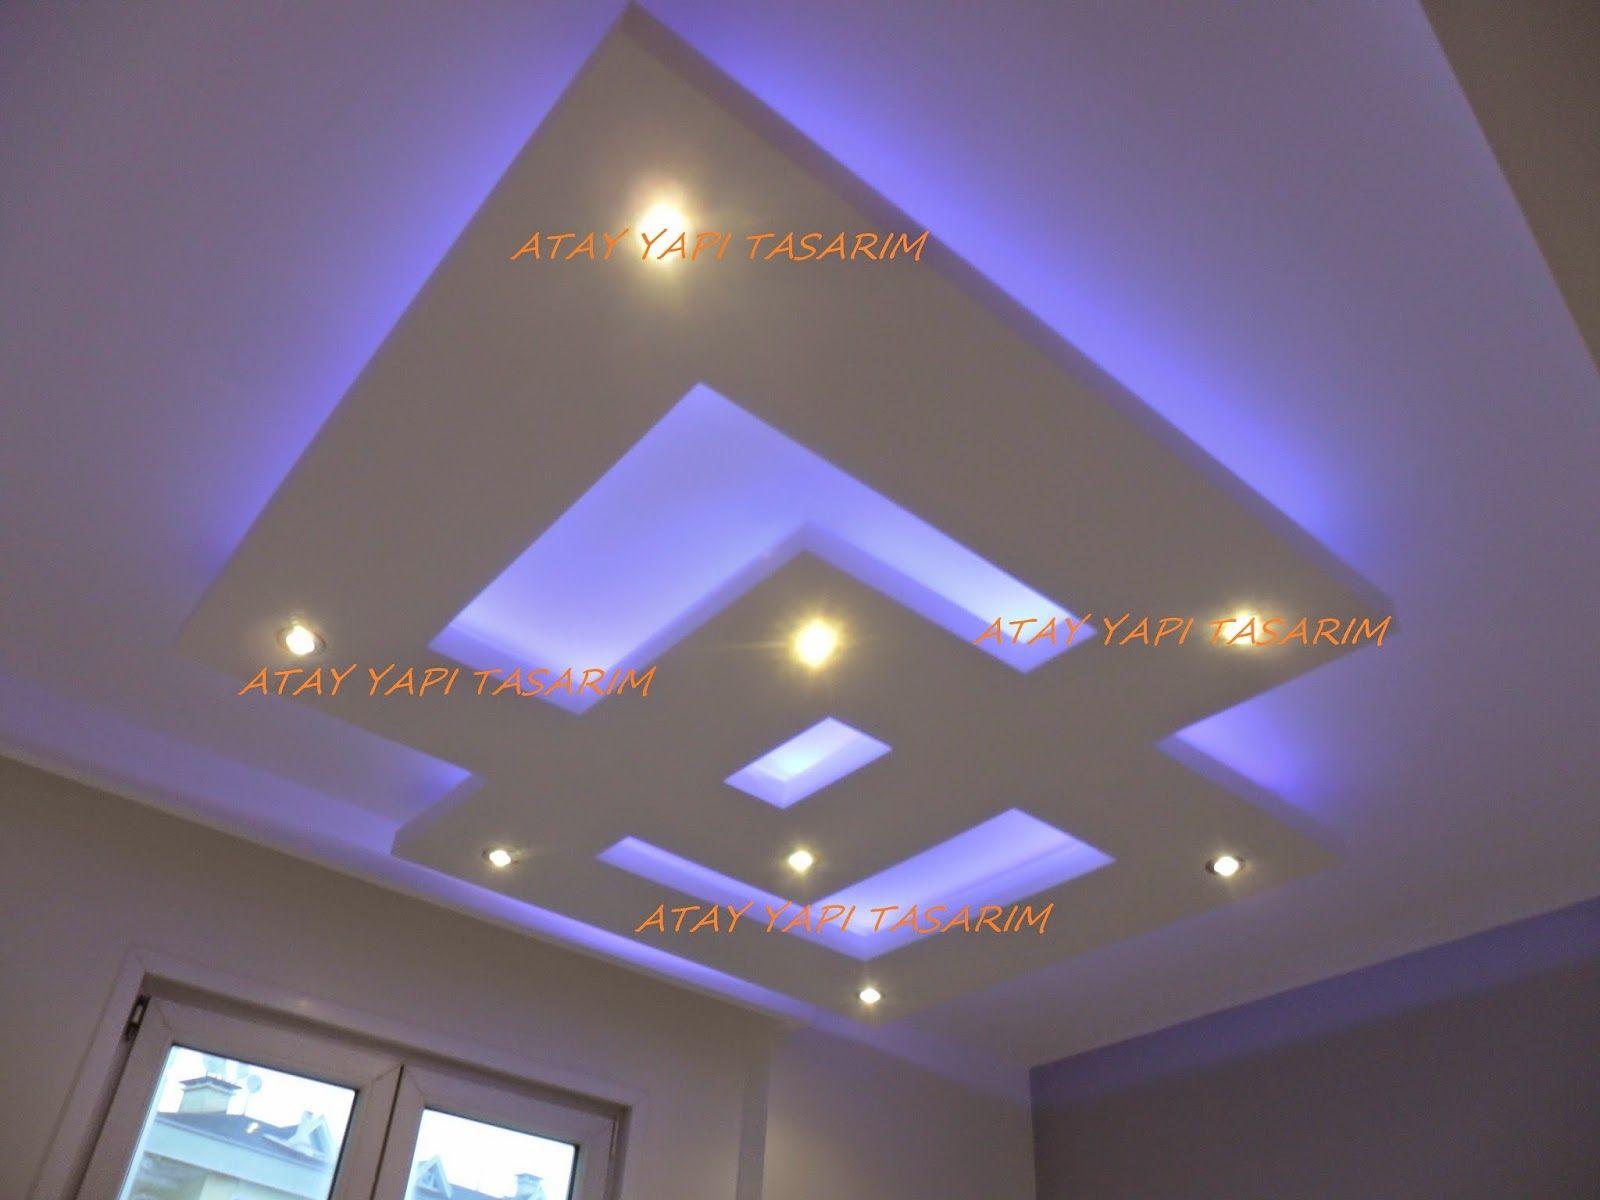 Magaza Tavan Modelleri Google Da Ara Bedroom False Ceiling Design Ceiling Design Pop Ceiling Design